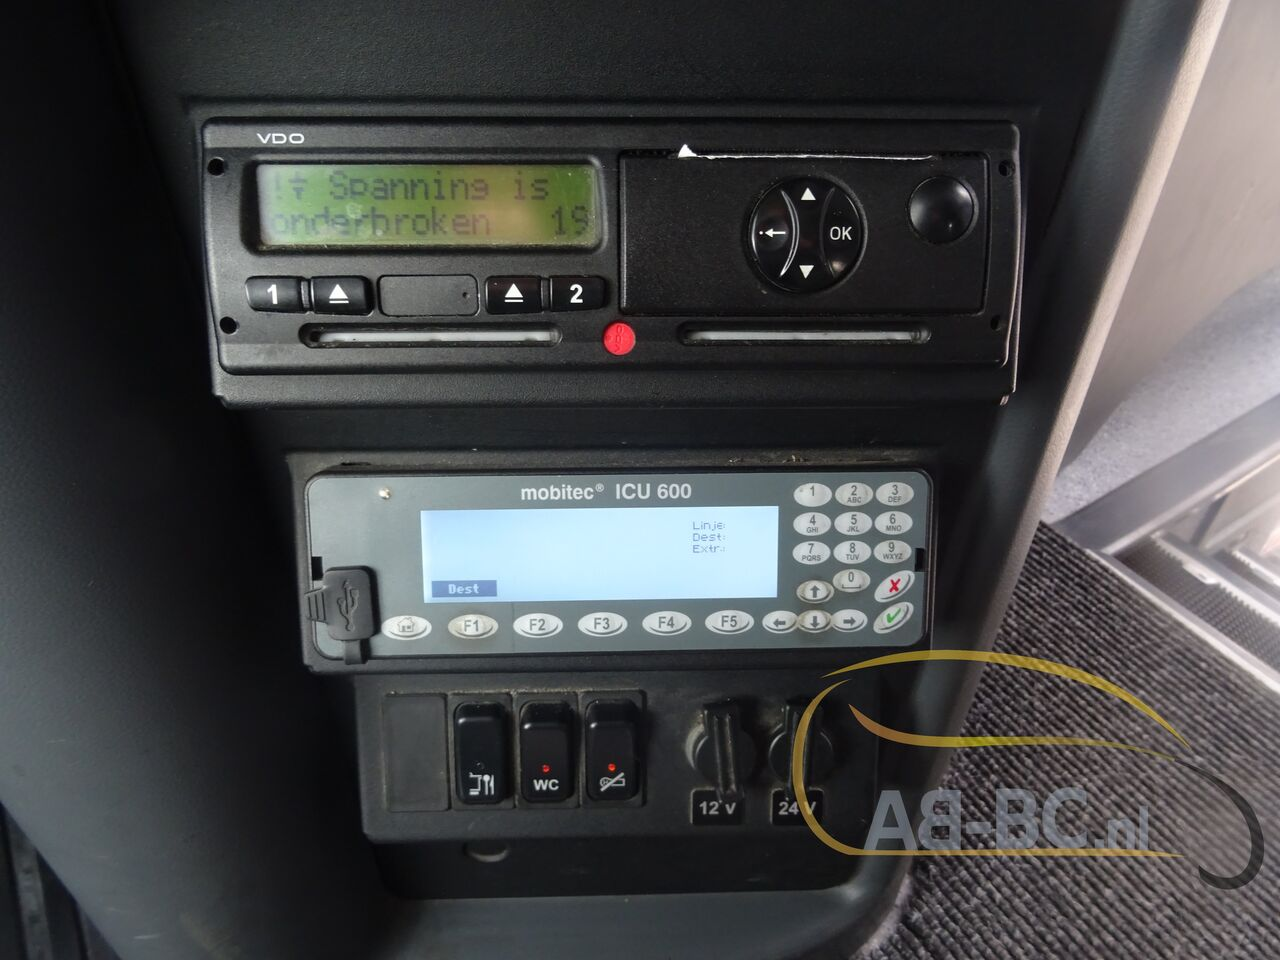 coach-busSETRA-S415-GT-HD-FINAL-EDITION---1627457076627395369_big_3a974e82911a9fb60a295eb40a541927--21050713010665719300